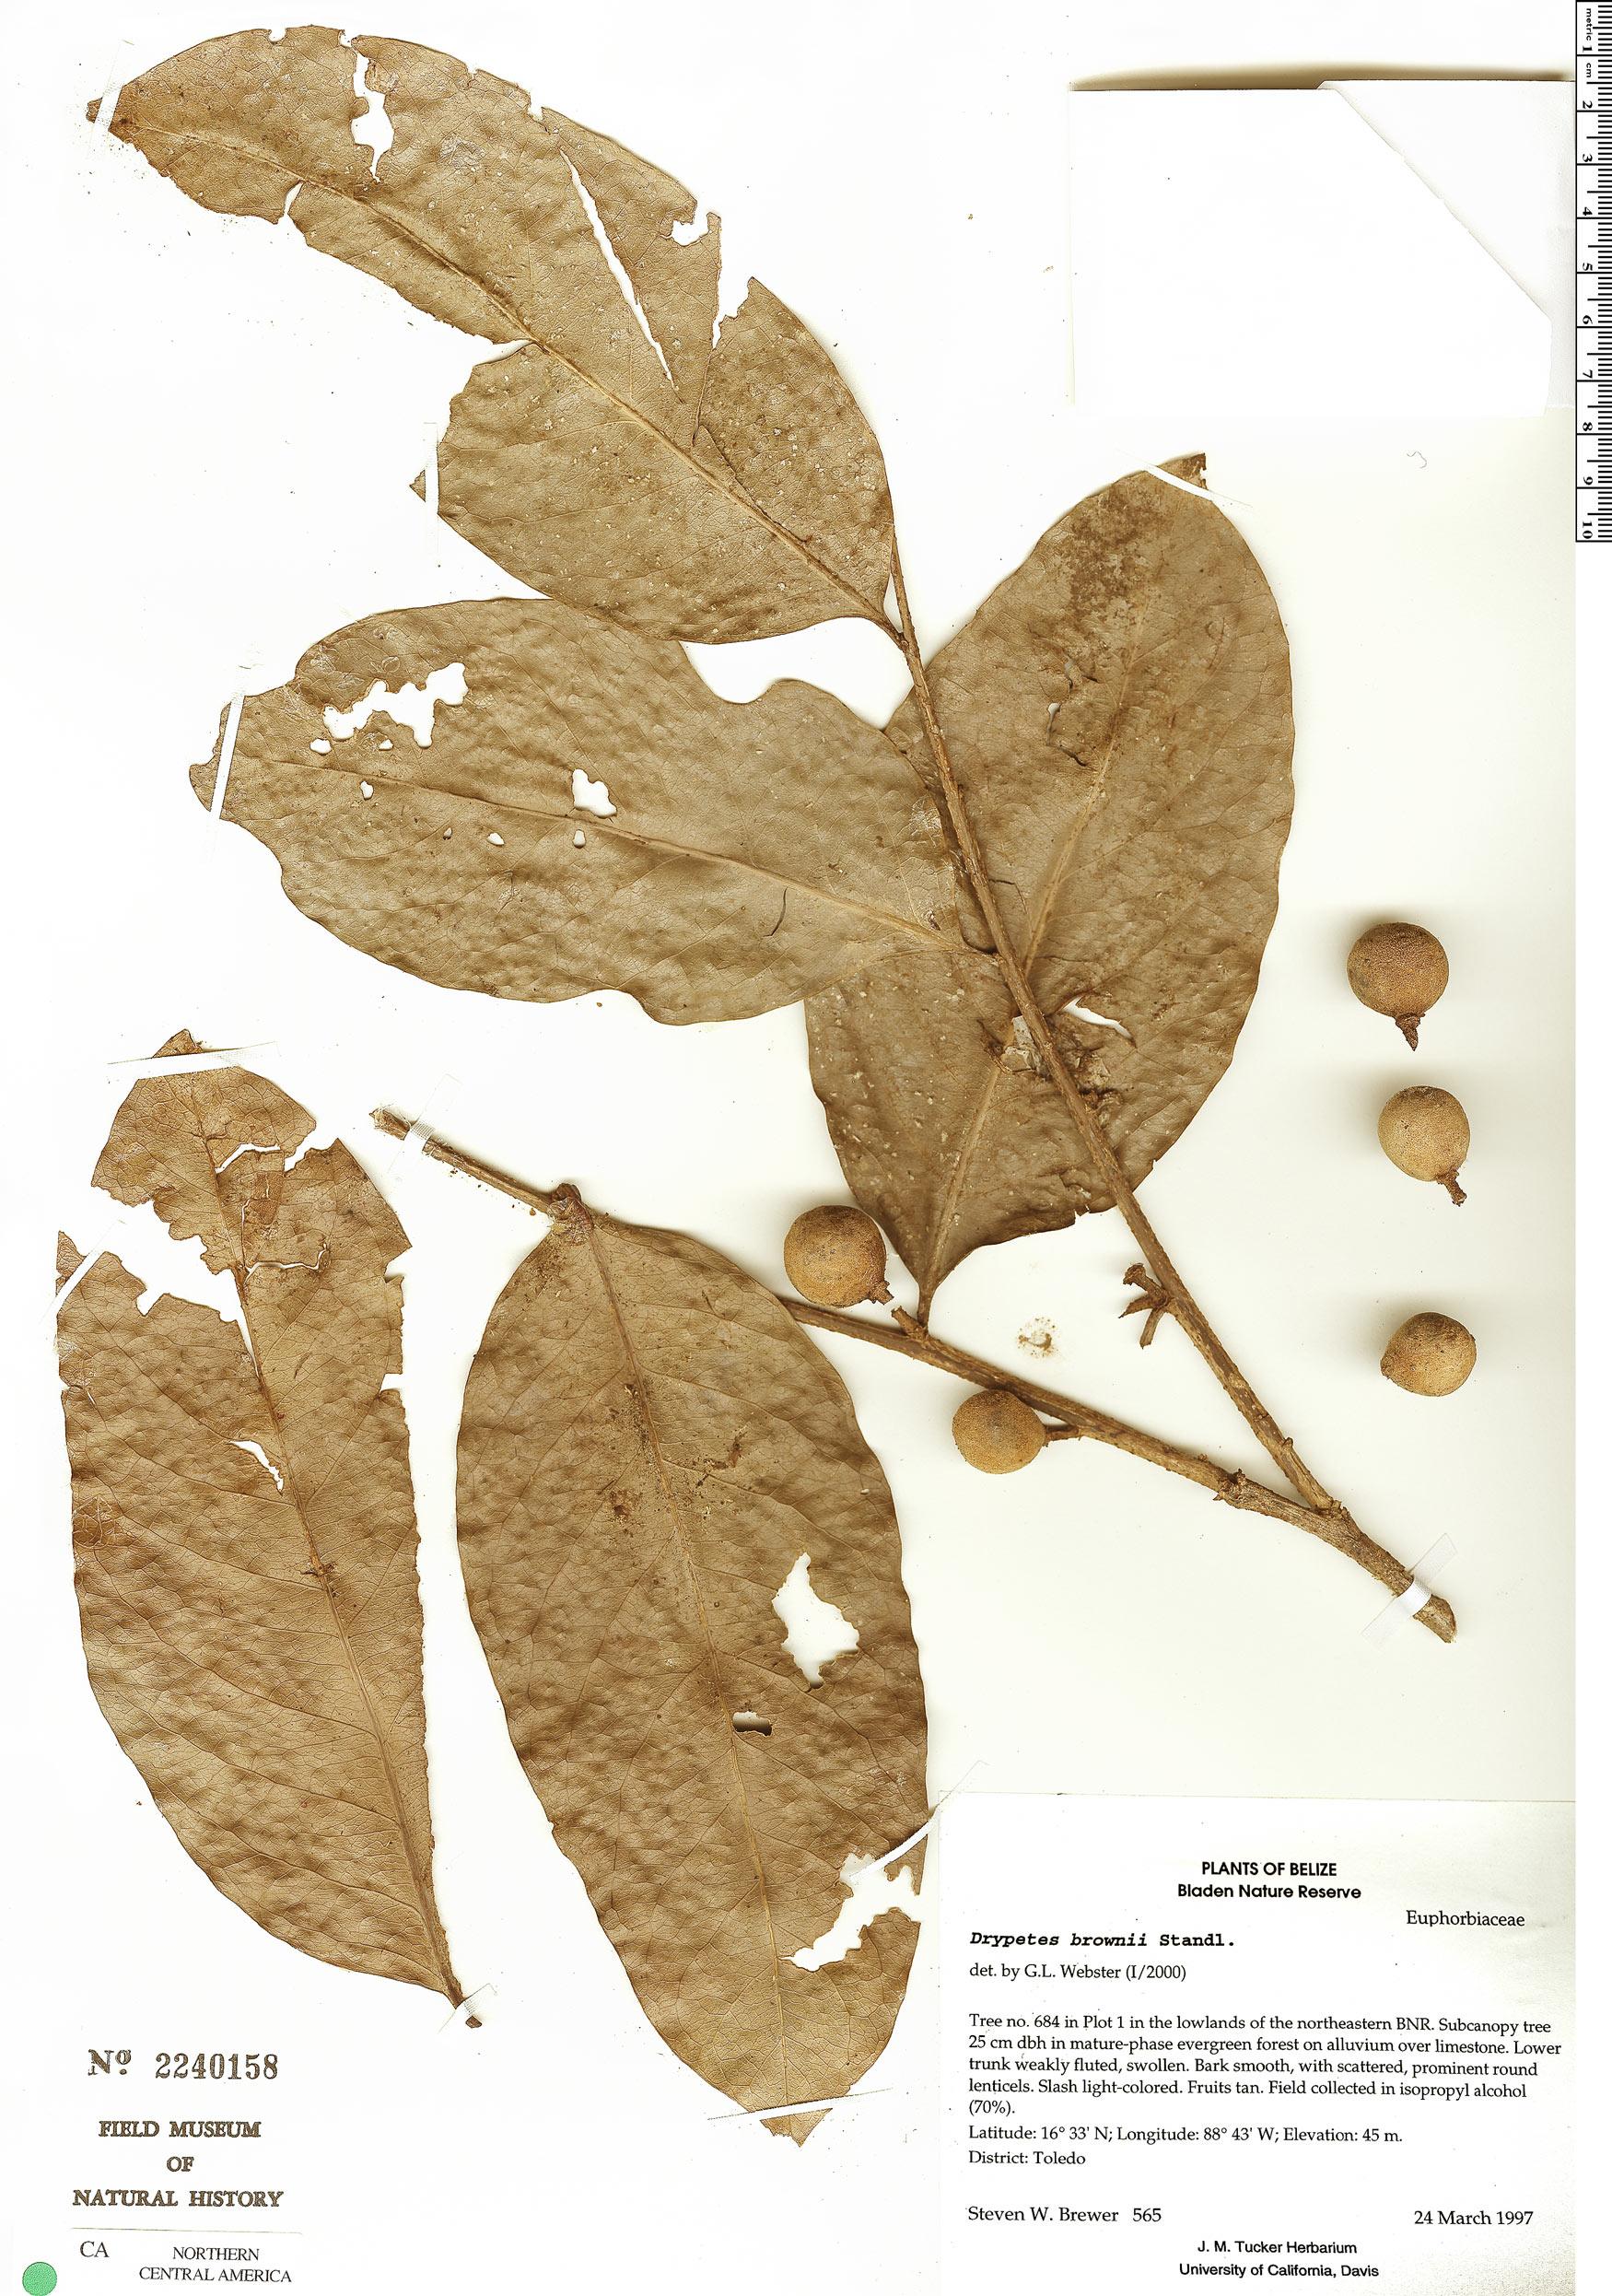 Specimen: Drypetes brownii